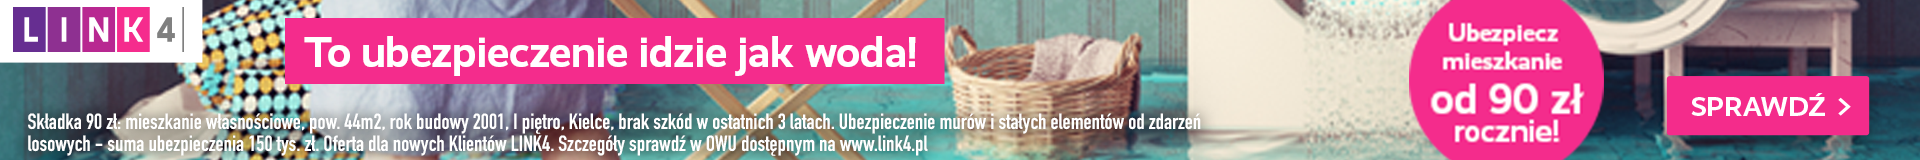 default-page-banner